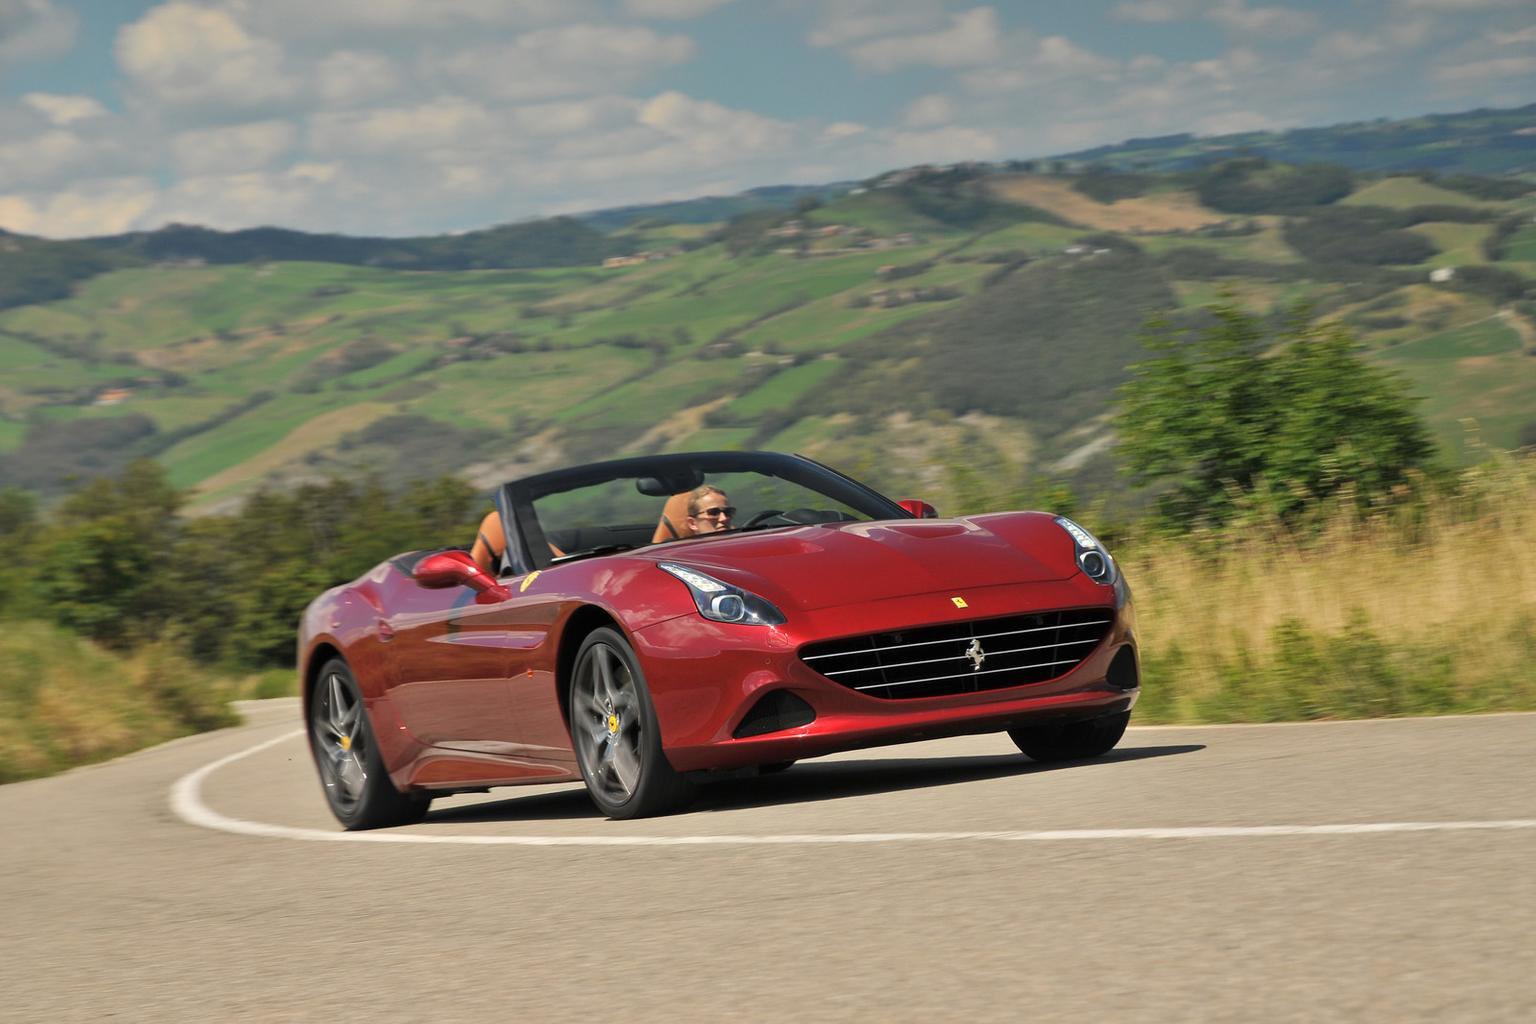 2014 Ferrari California T review